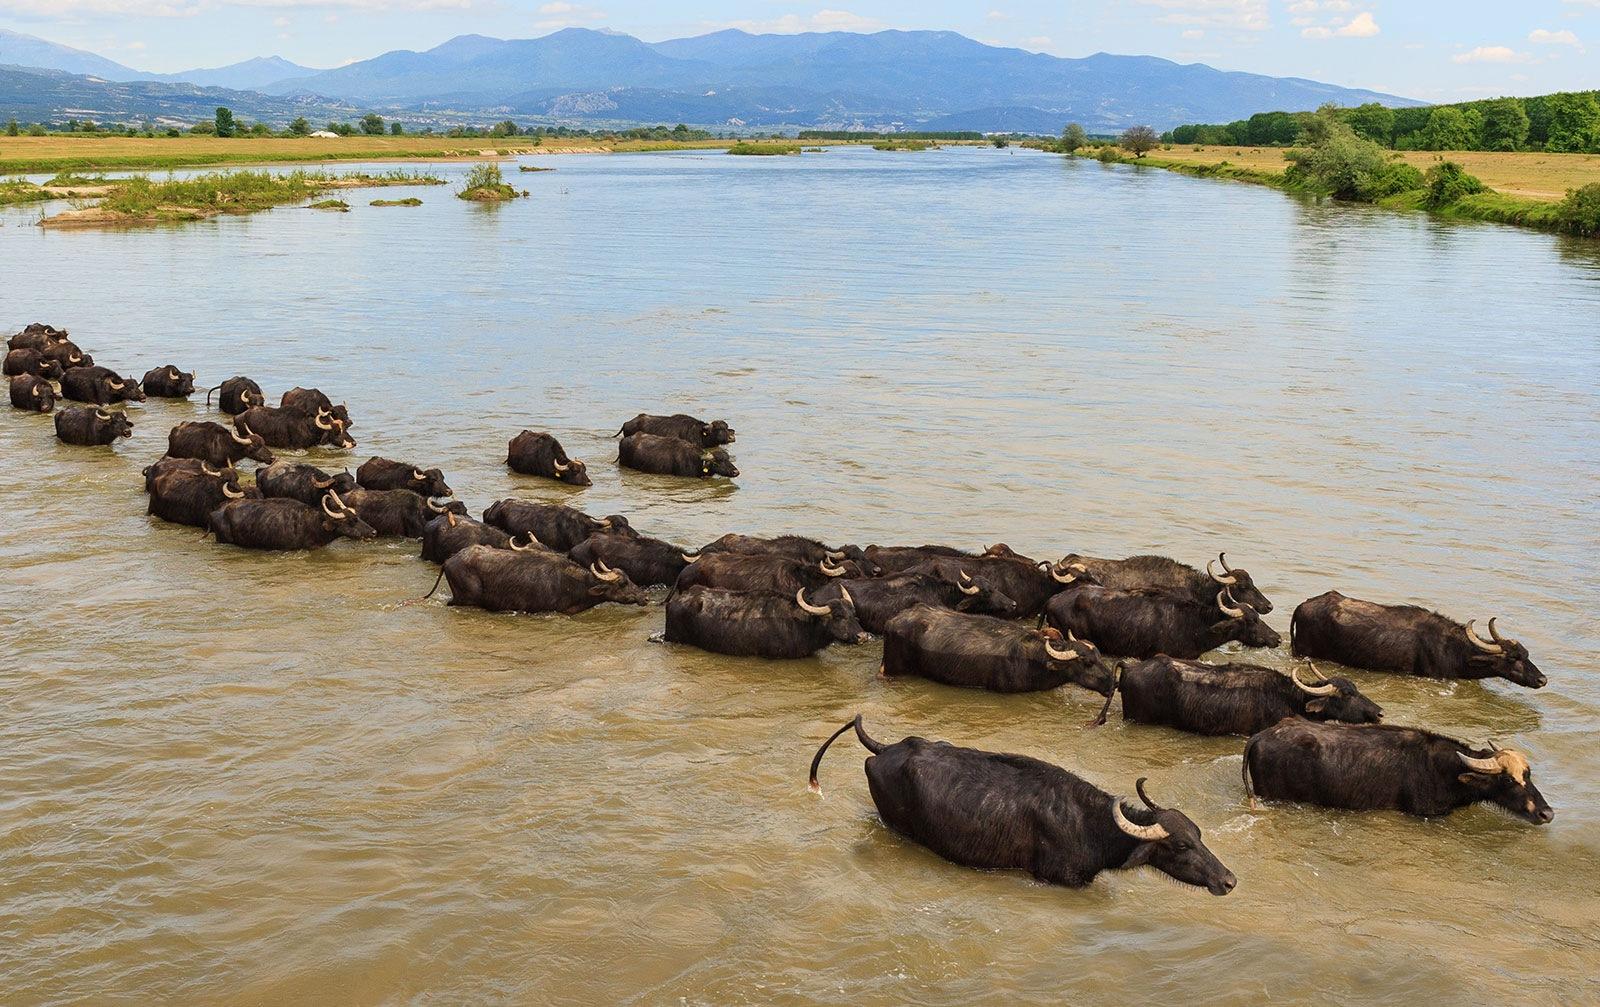 The water buffalos  in Strymonas river  near lake Kerkini by Sotiris Siomis